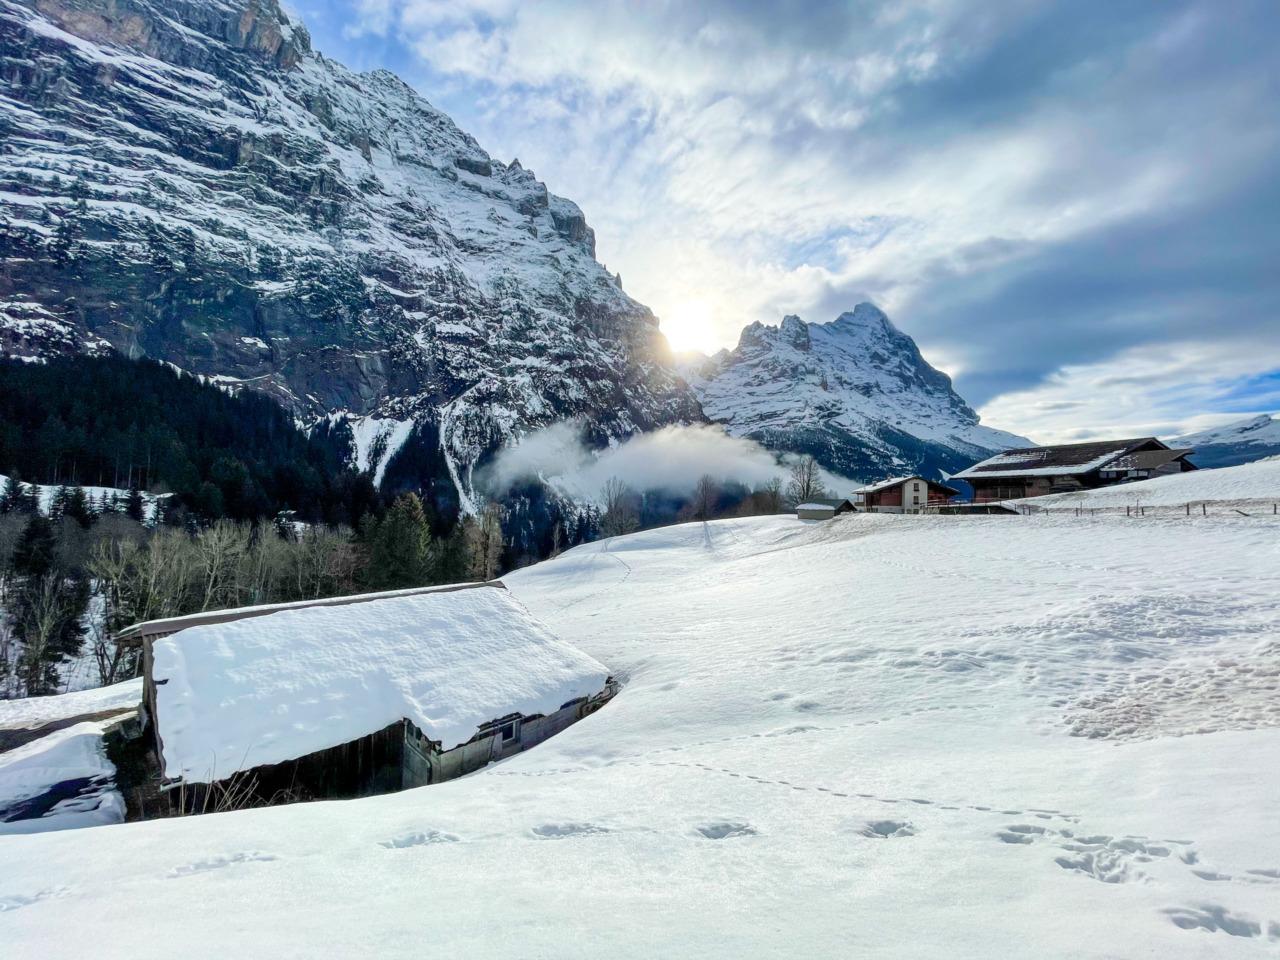 Eiger from Grindelwald